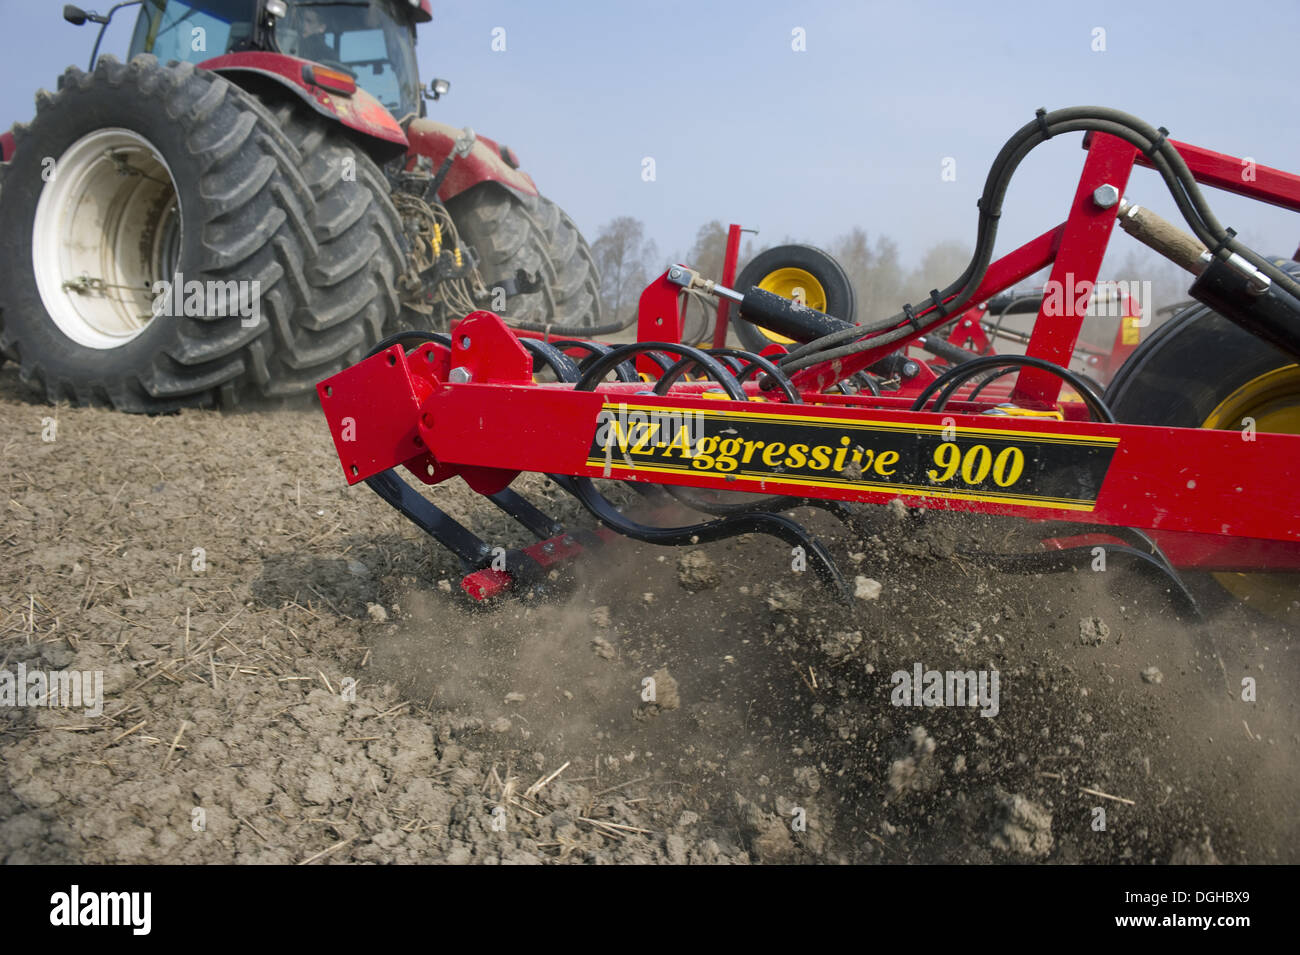 Tractor with Vaderstad NZA-900 harrows, harrowing arable field, Sweden, april - Stock Image